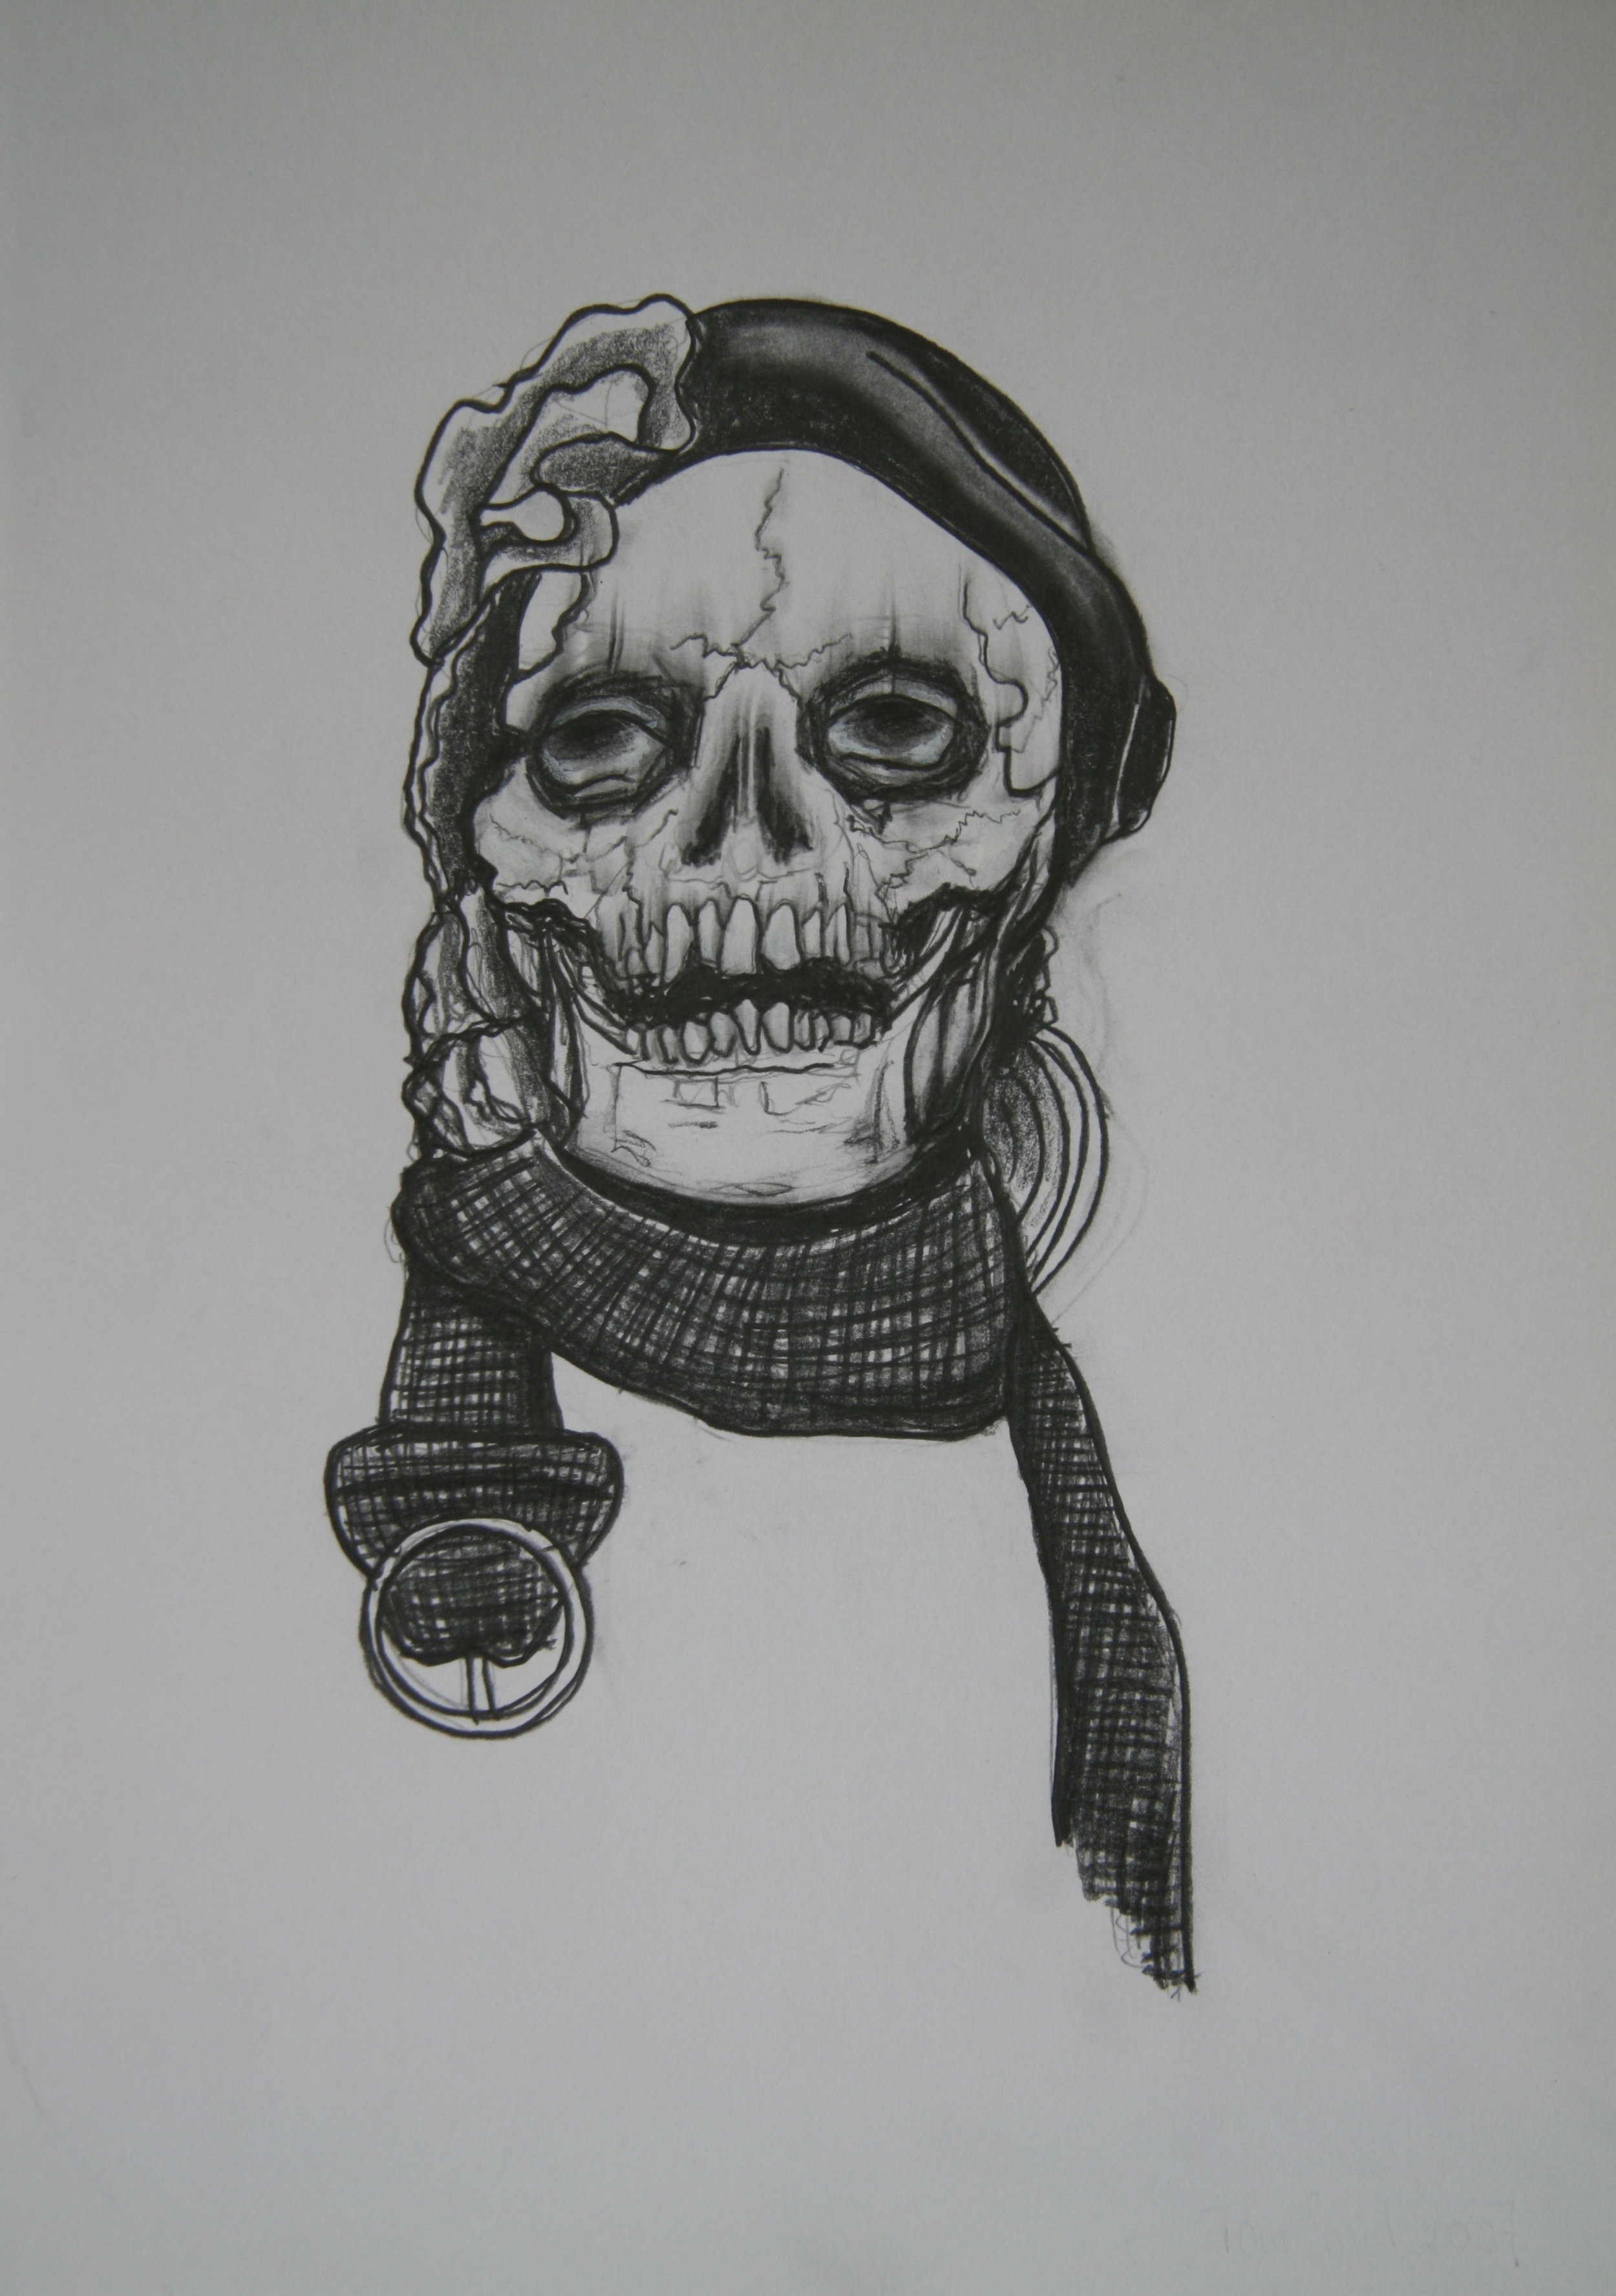 Skull 5, 30x21cm, pencil on paper